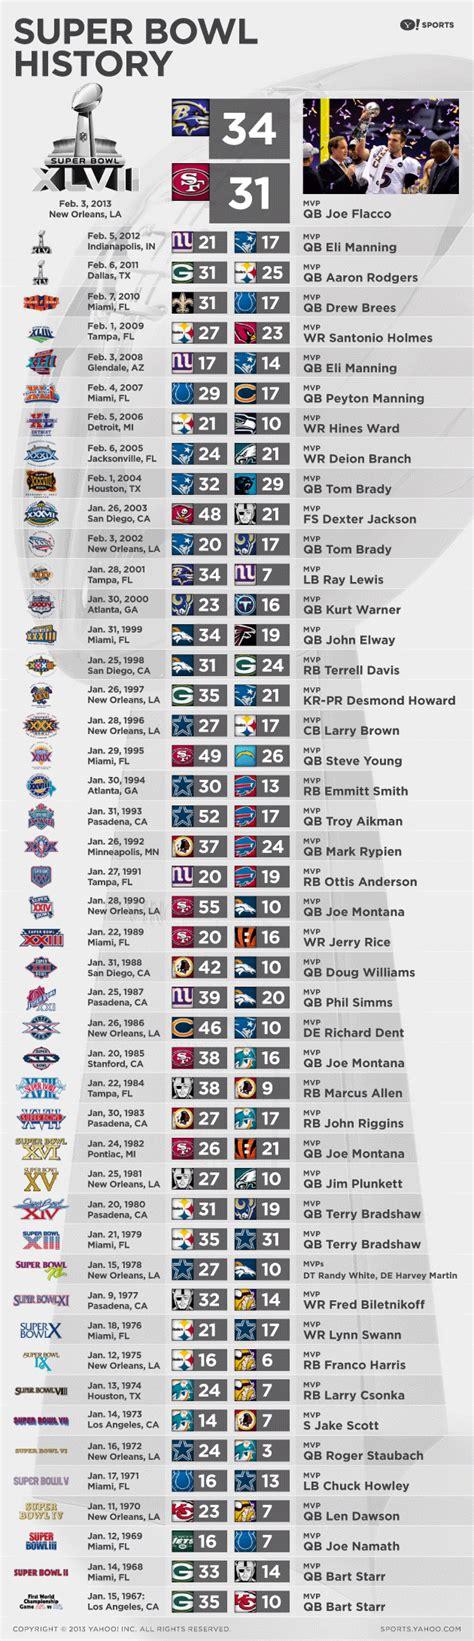 Super Bowl history | Nfl super bowl history, Super bowl ...